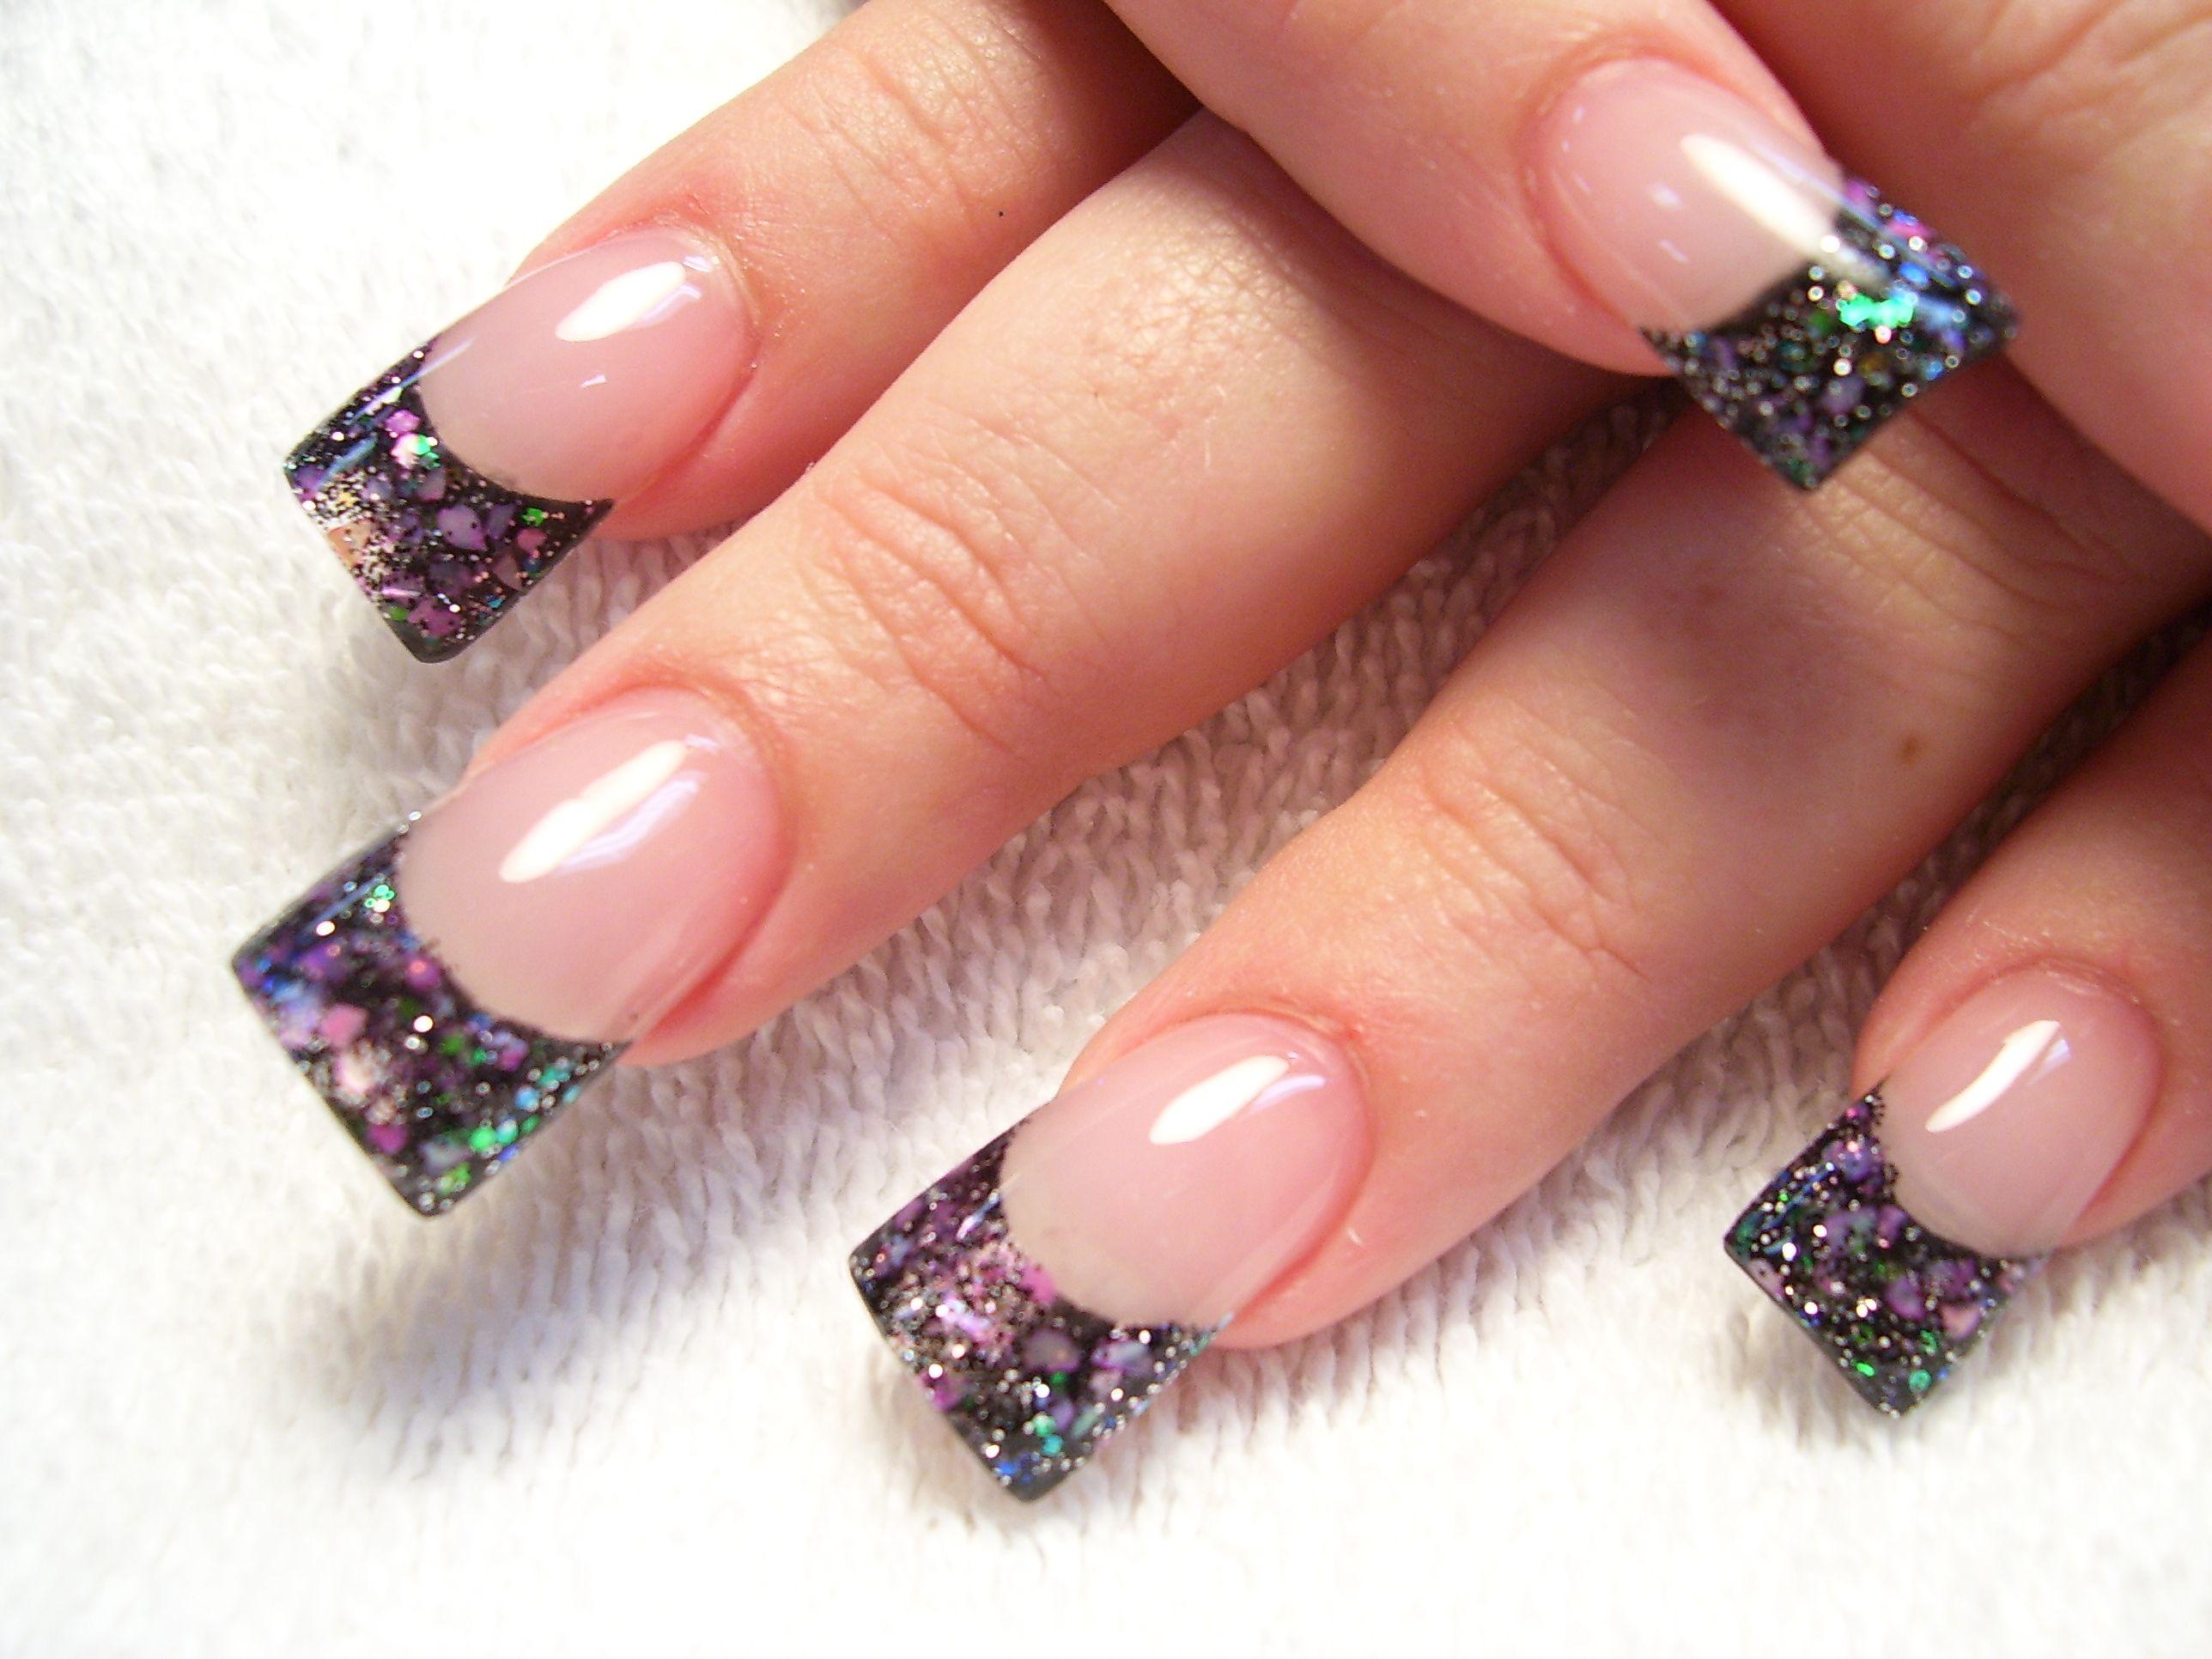 Strange french nails with glitter   Nails   Pinterest